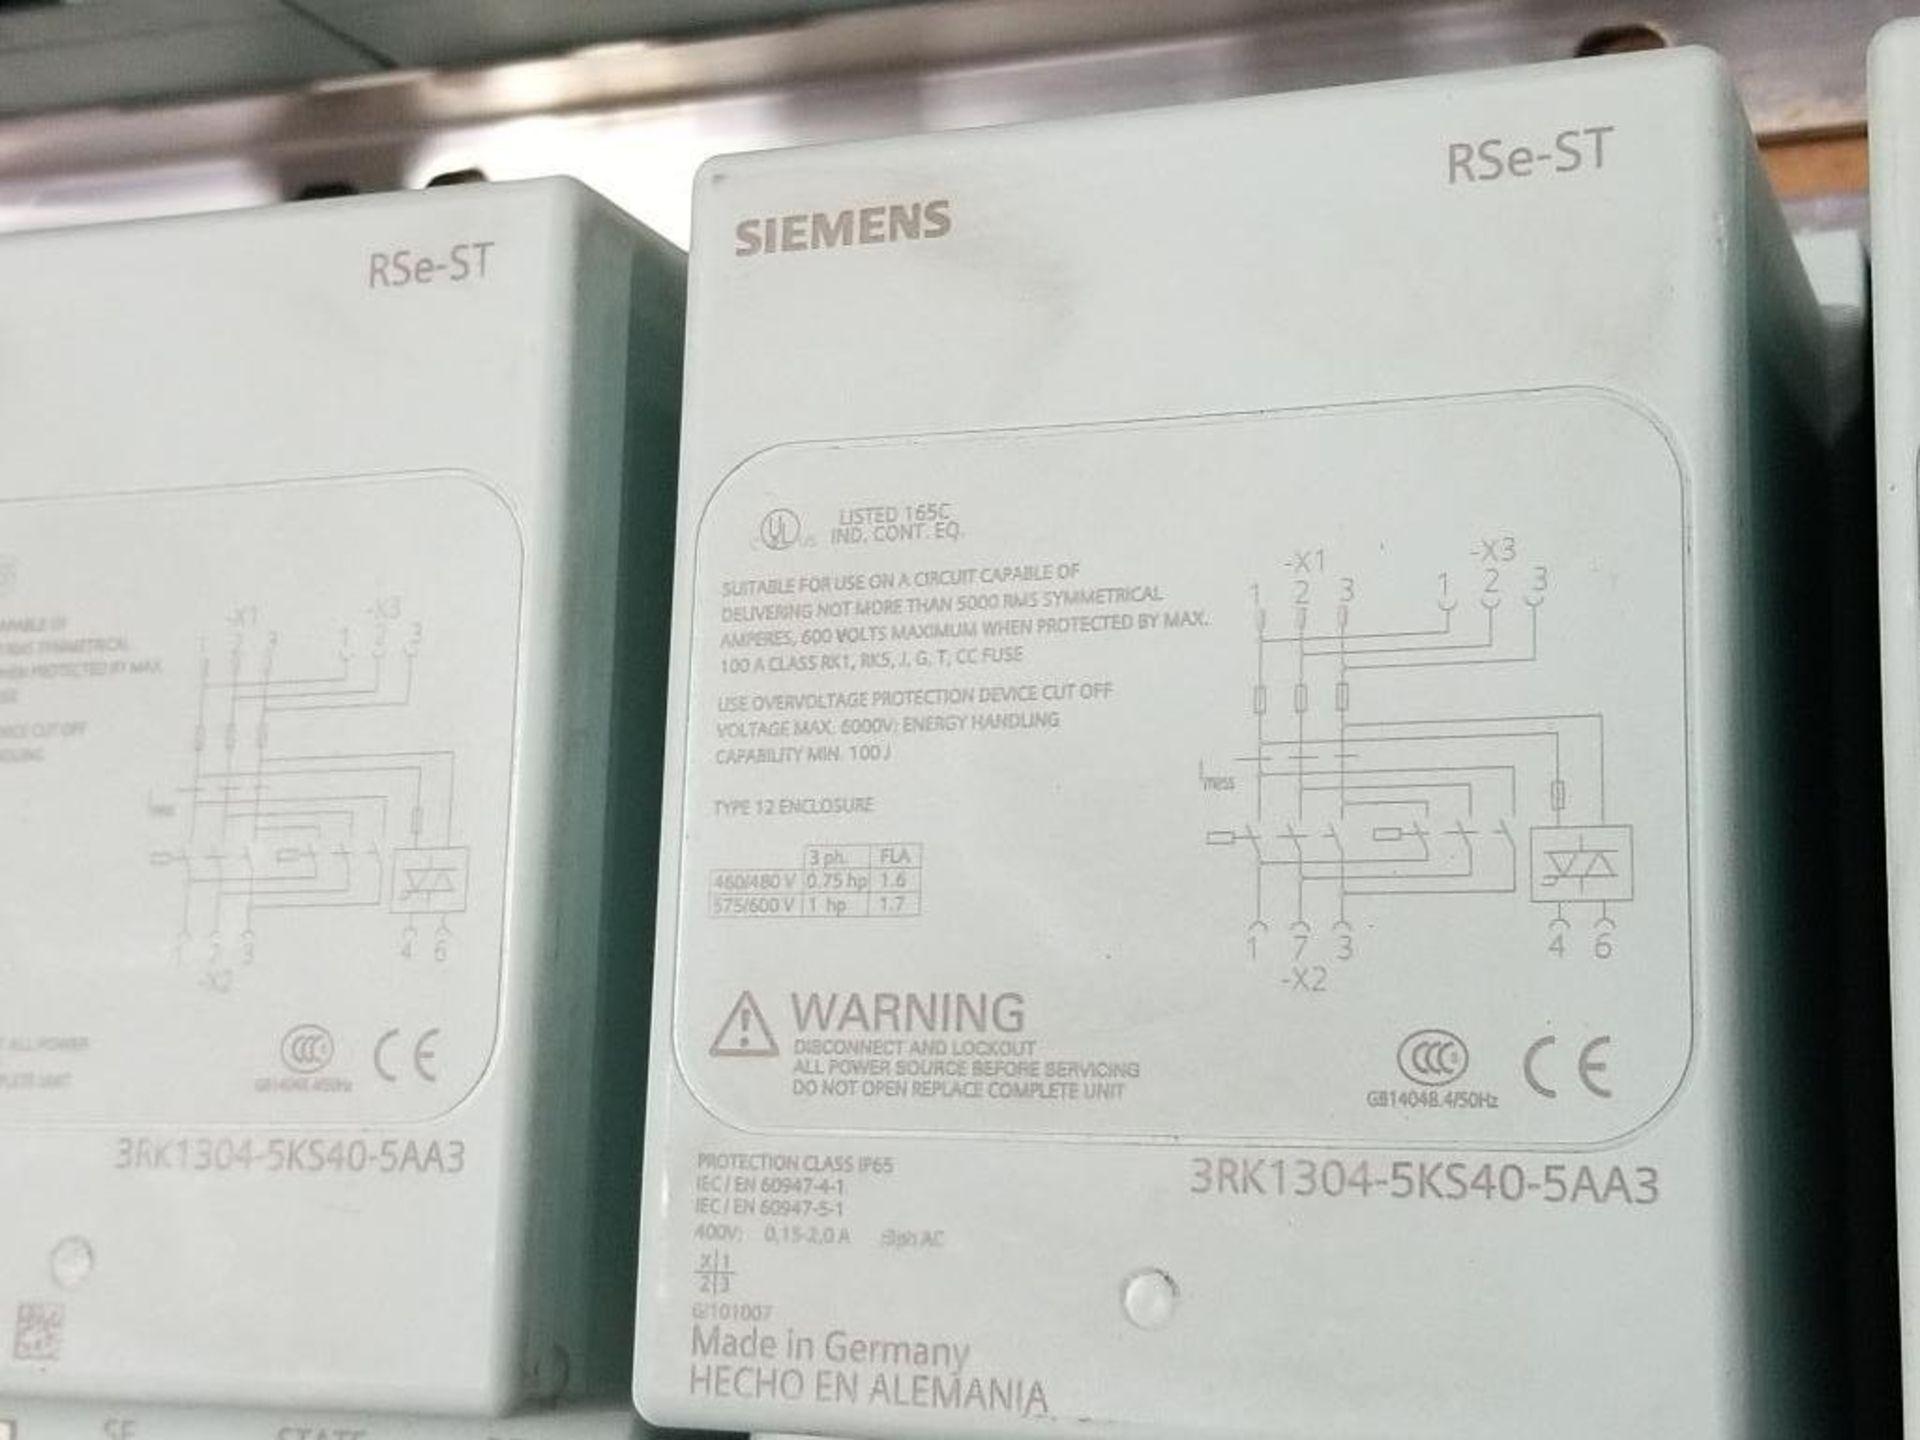 Siemens RSe-ST Reversing starter, DSe-ST Disconnect module flow control line. - Image 4 of 9